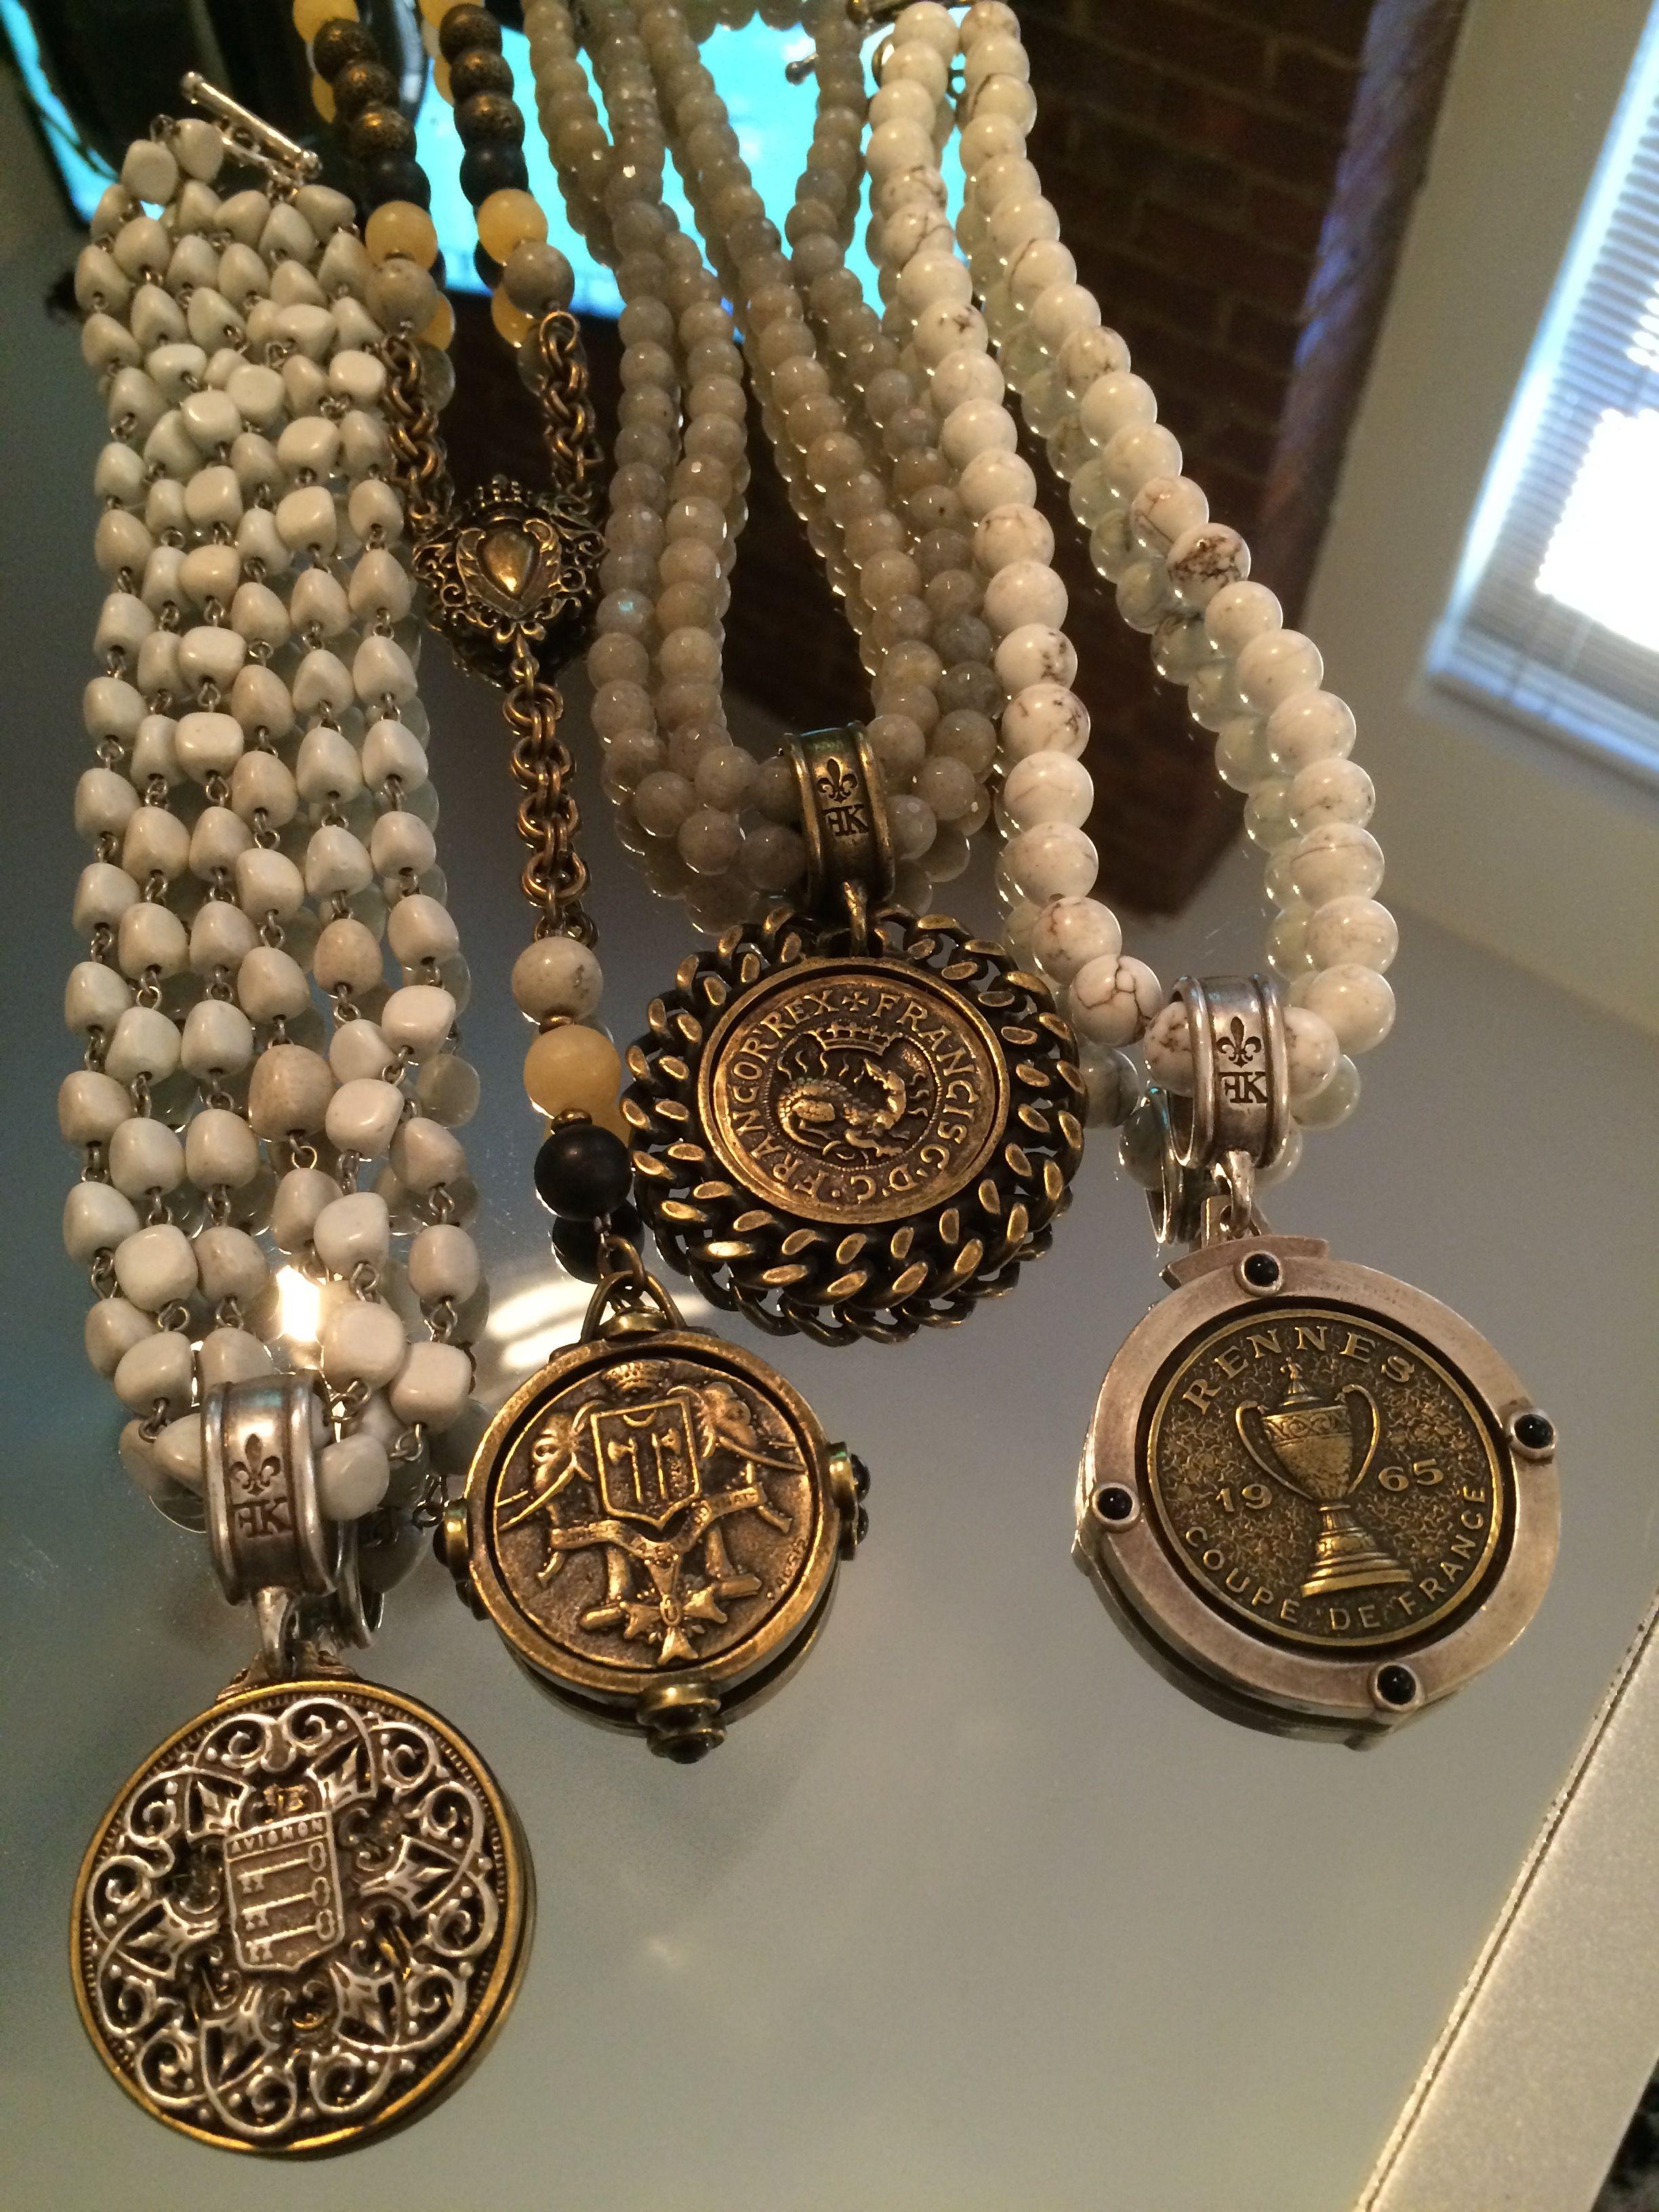 24+ Jewelry similar to french kande ideas